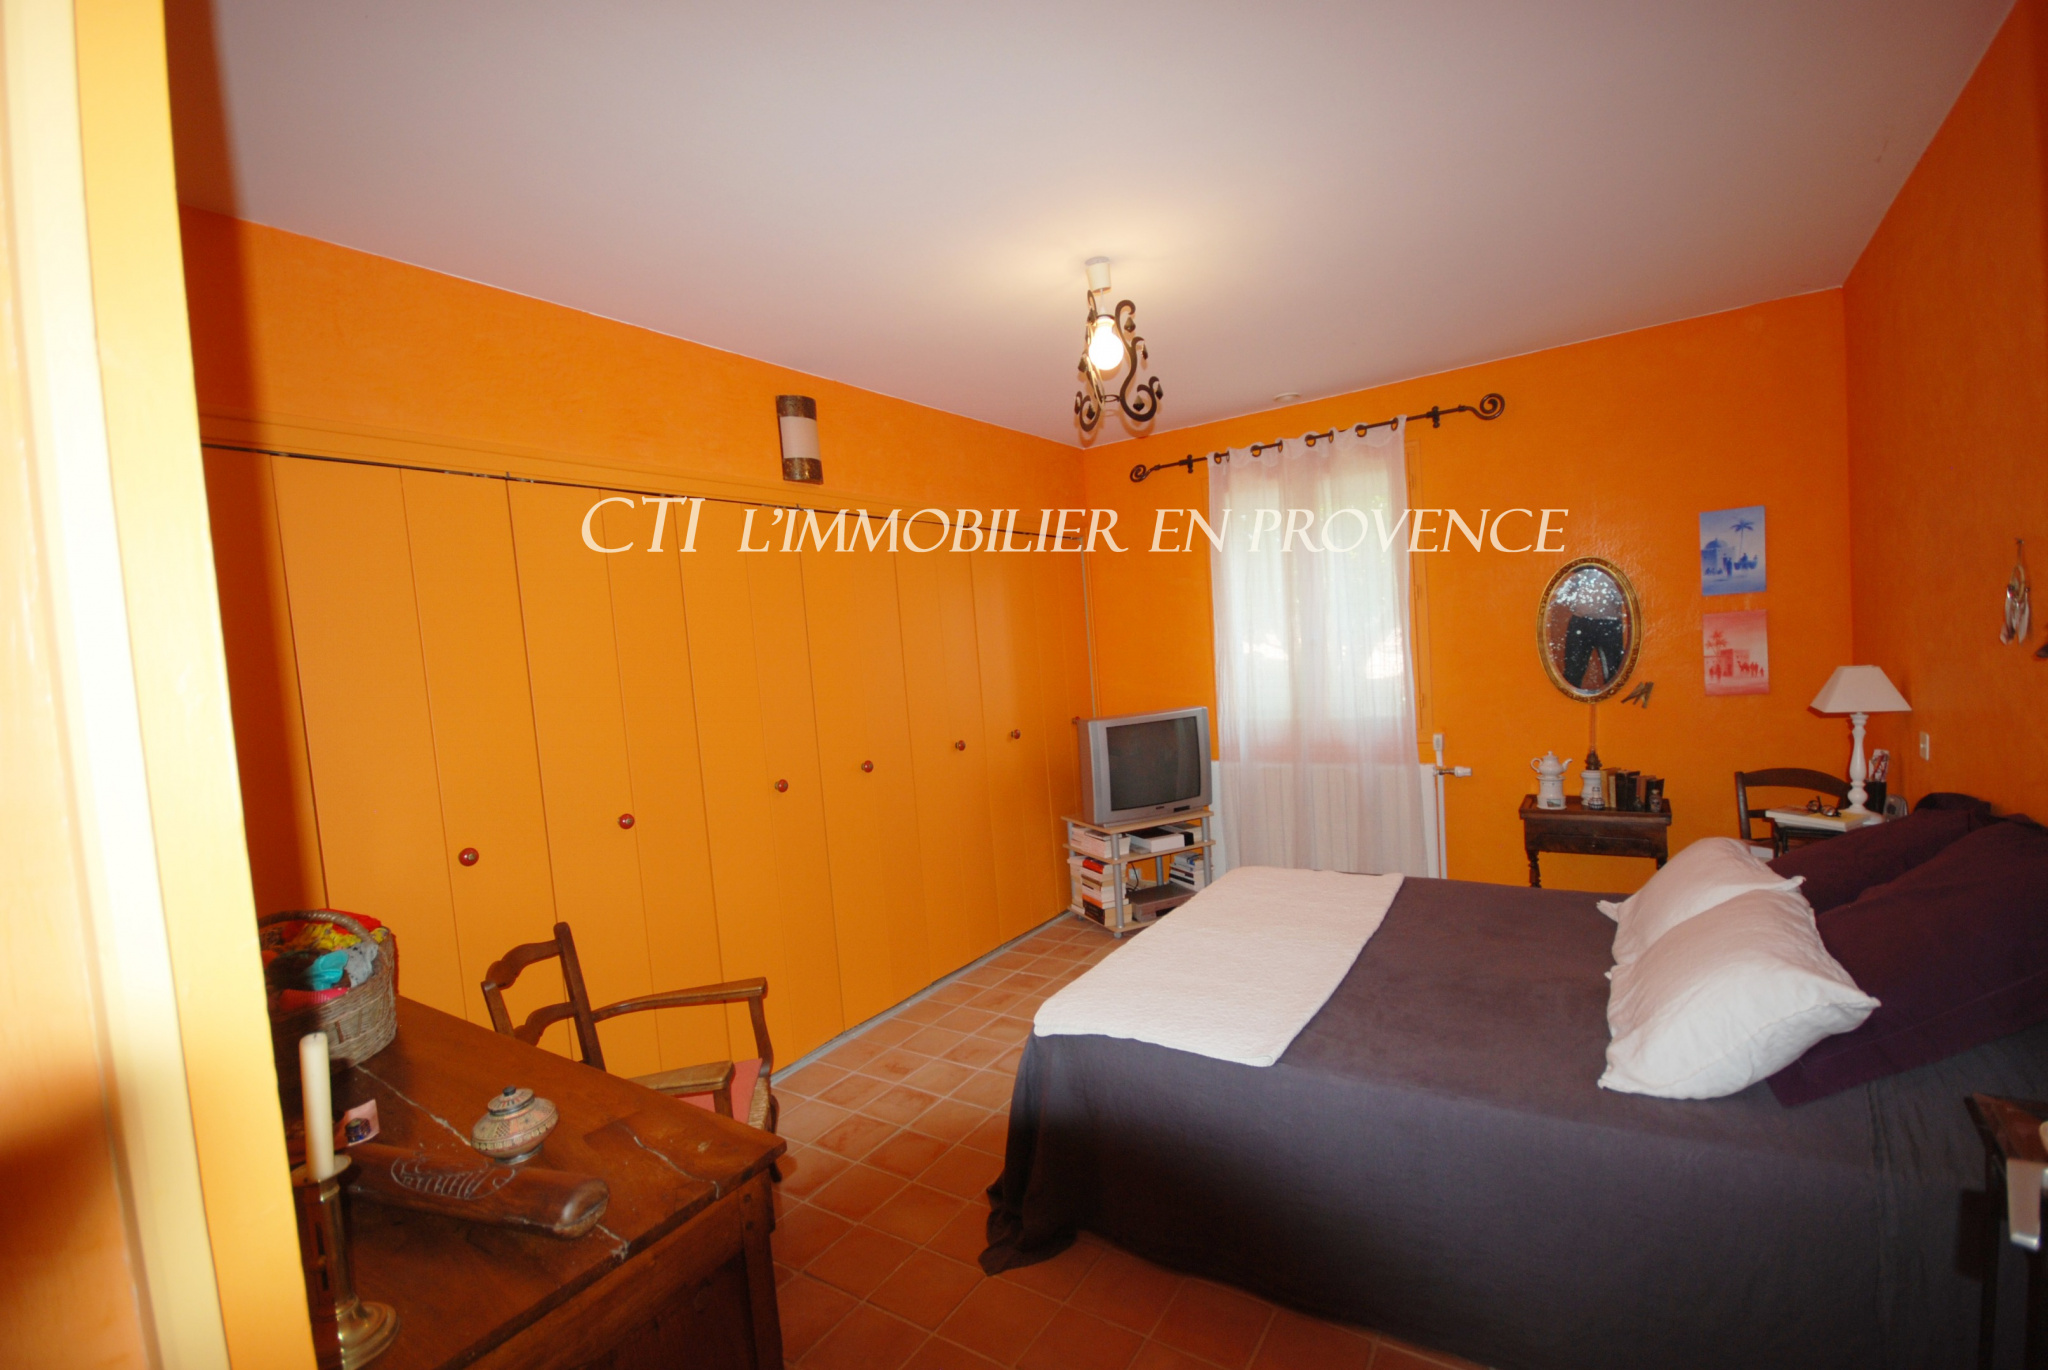 0 www.cti-provence.net, vente villa plain pied (4 chambres) jardin, piscine, garage, commerces